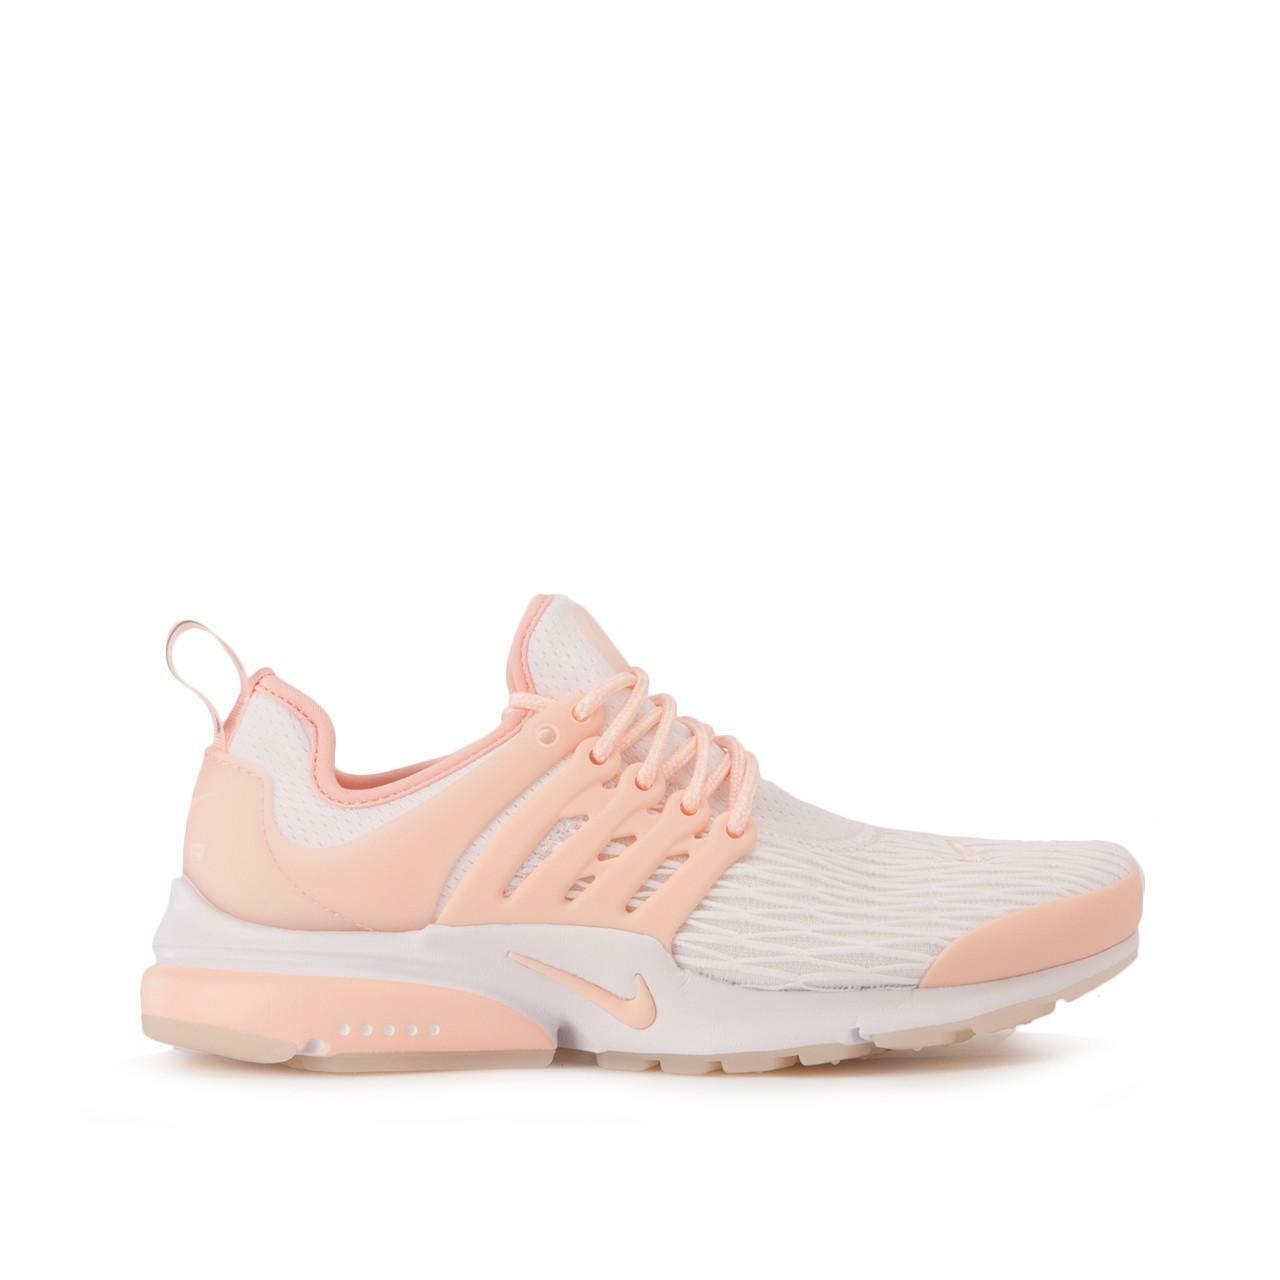 damen Nike Air Presto Premium Weiß Trainers 878071 102